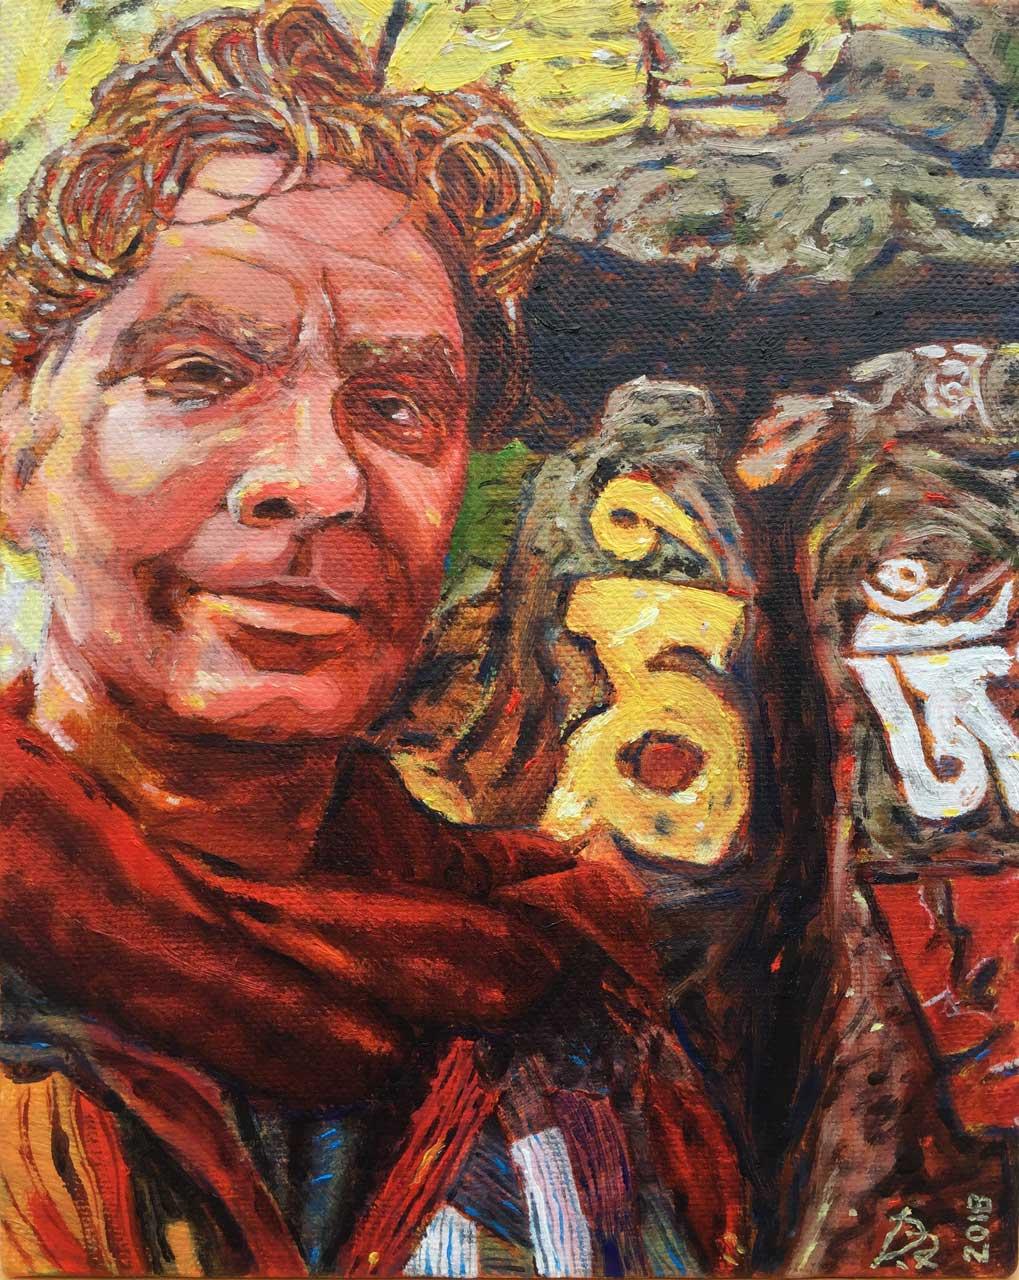 Dave Alber, Self-Portrait at Swayambunath, Kathmandu, Nepal